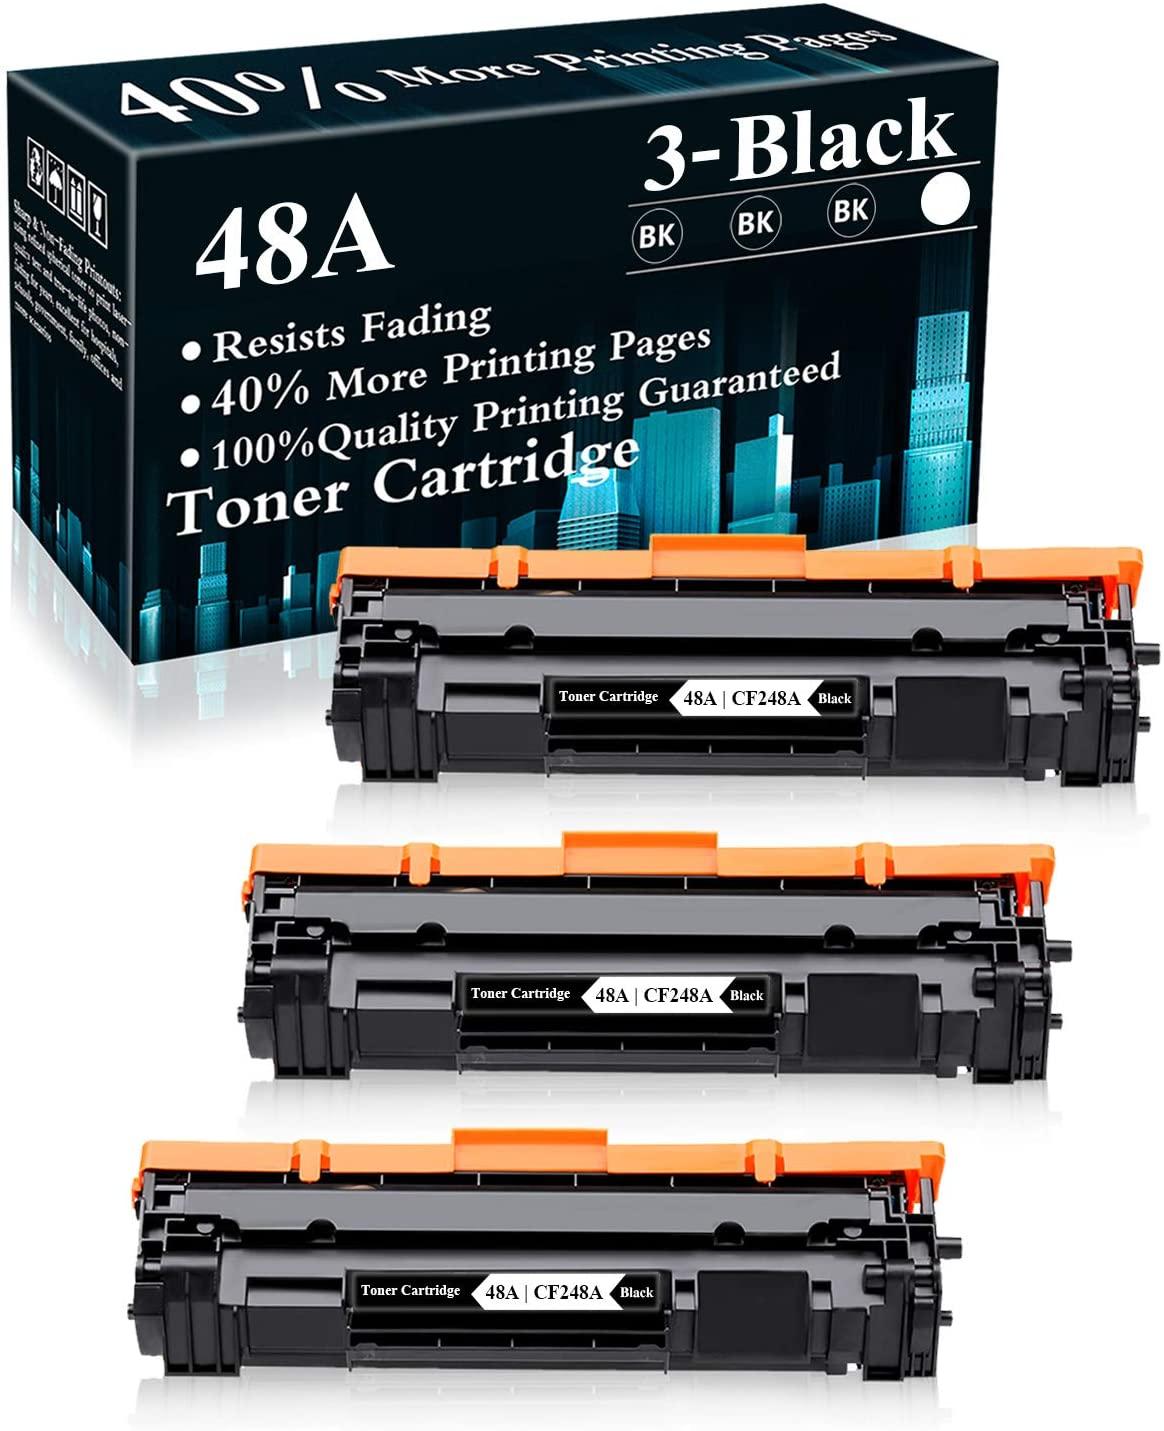 3 Pack 48A | CF248A Black Compatible Toner Cartridge Replacement for HP Laserjet Pro M15a M15w MFP M28a MFP M28w MFP M29w MFP M30w MFP M31w Printer,Sold by TopInk